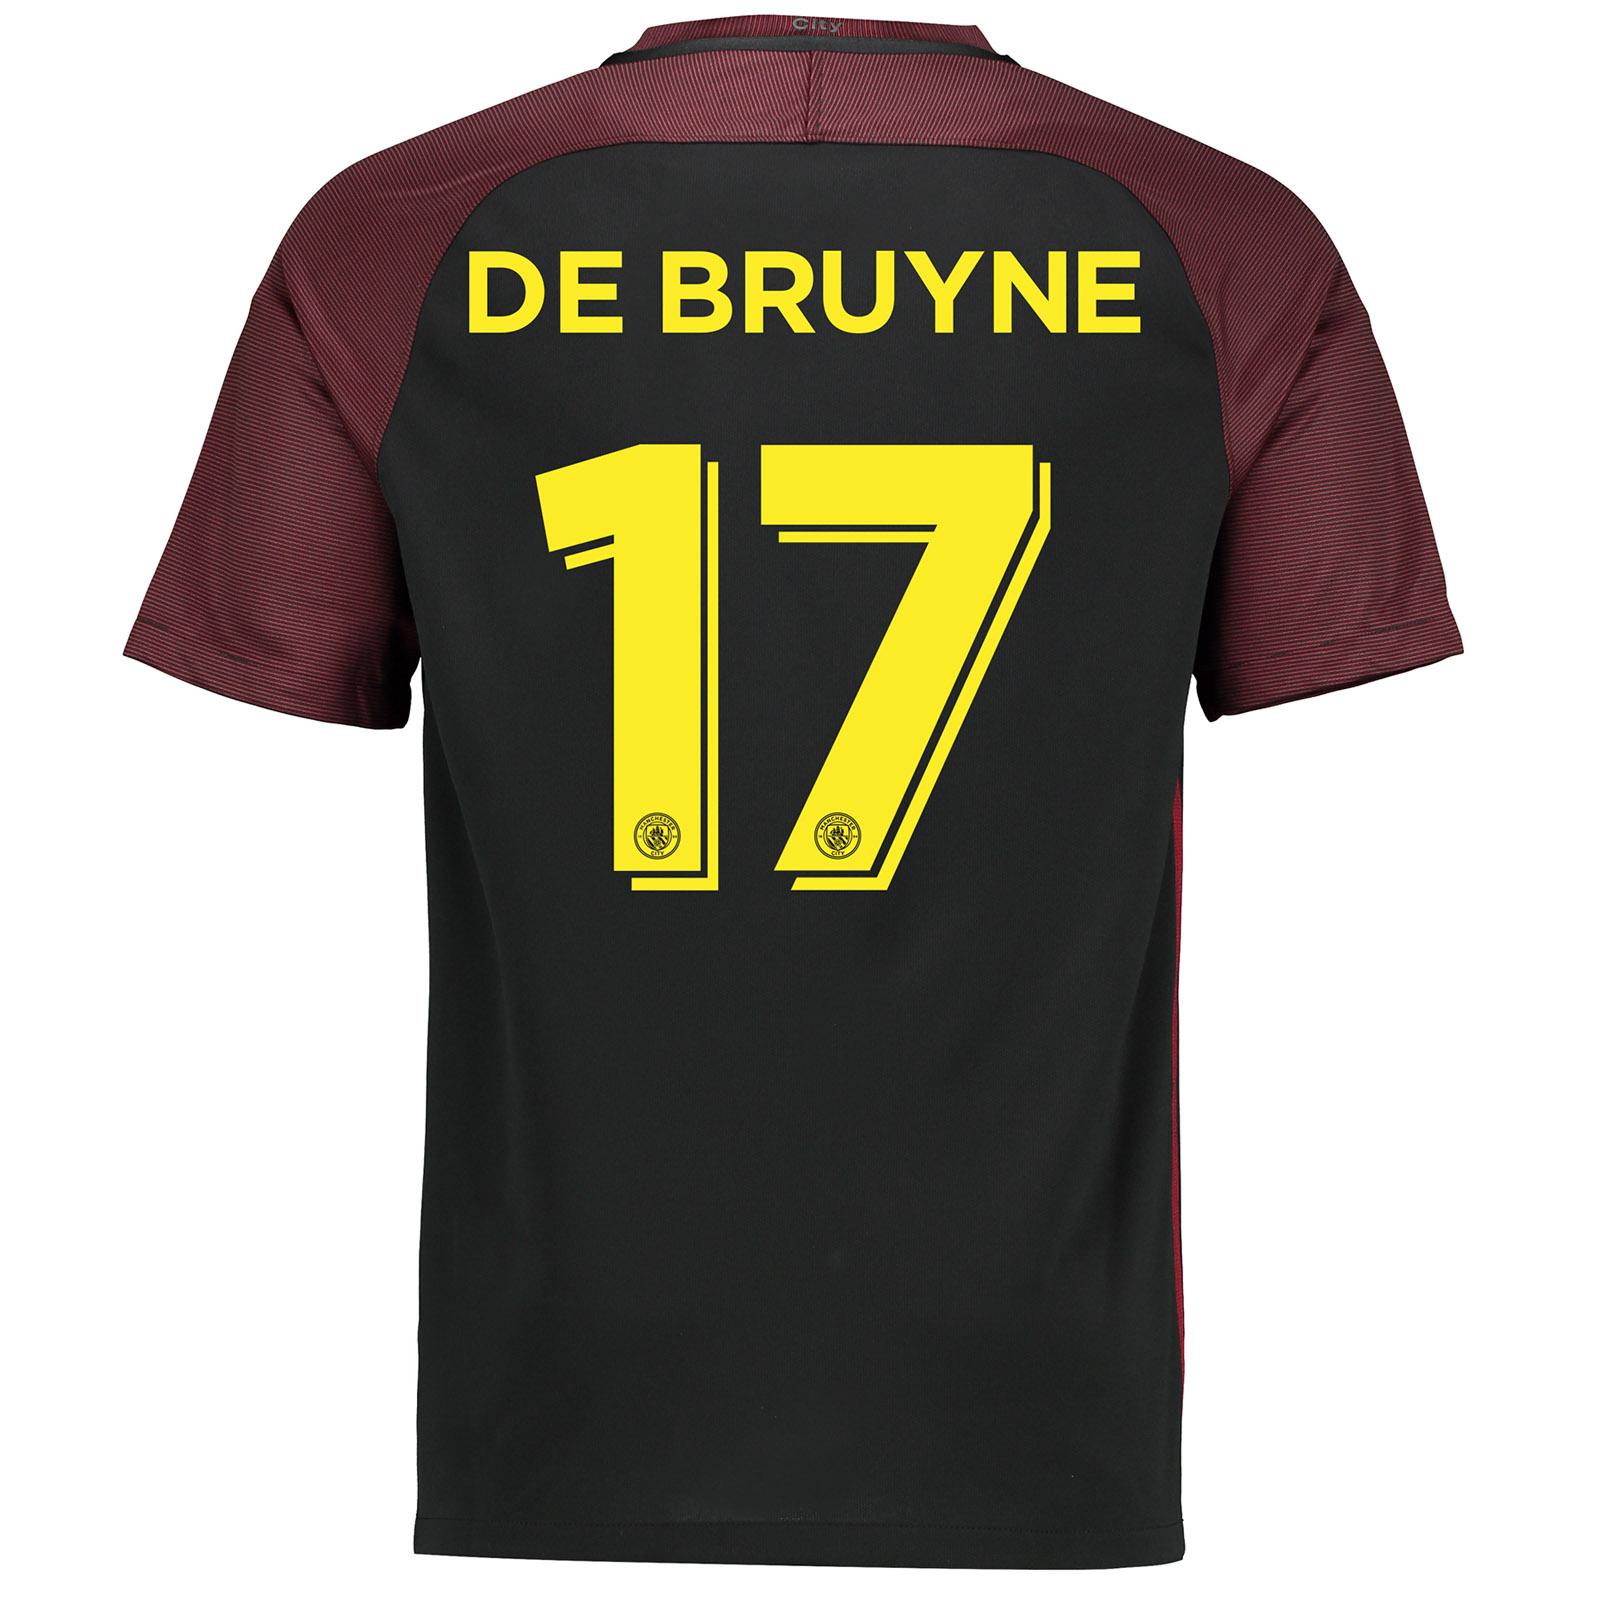 Manchester City Away Cup Stadium Shirt 2016-17 with De Bruyne 17 print